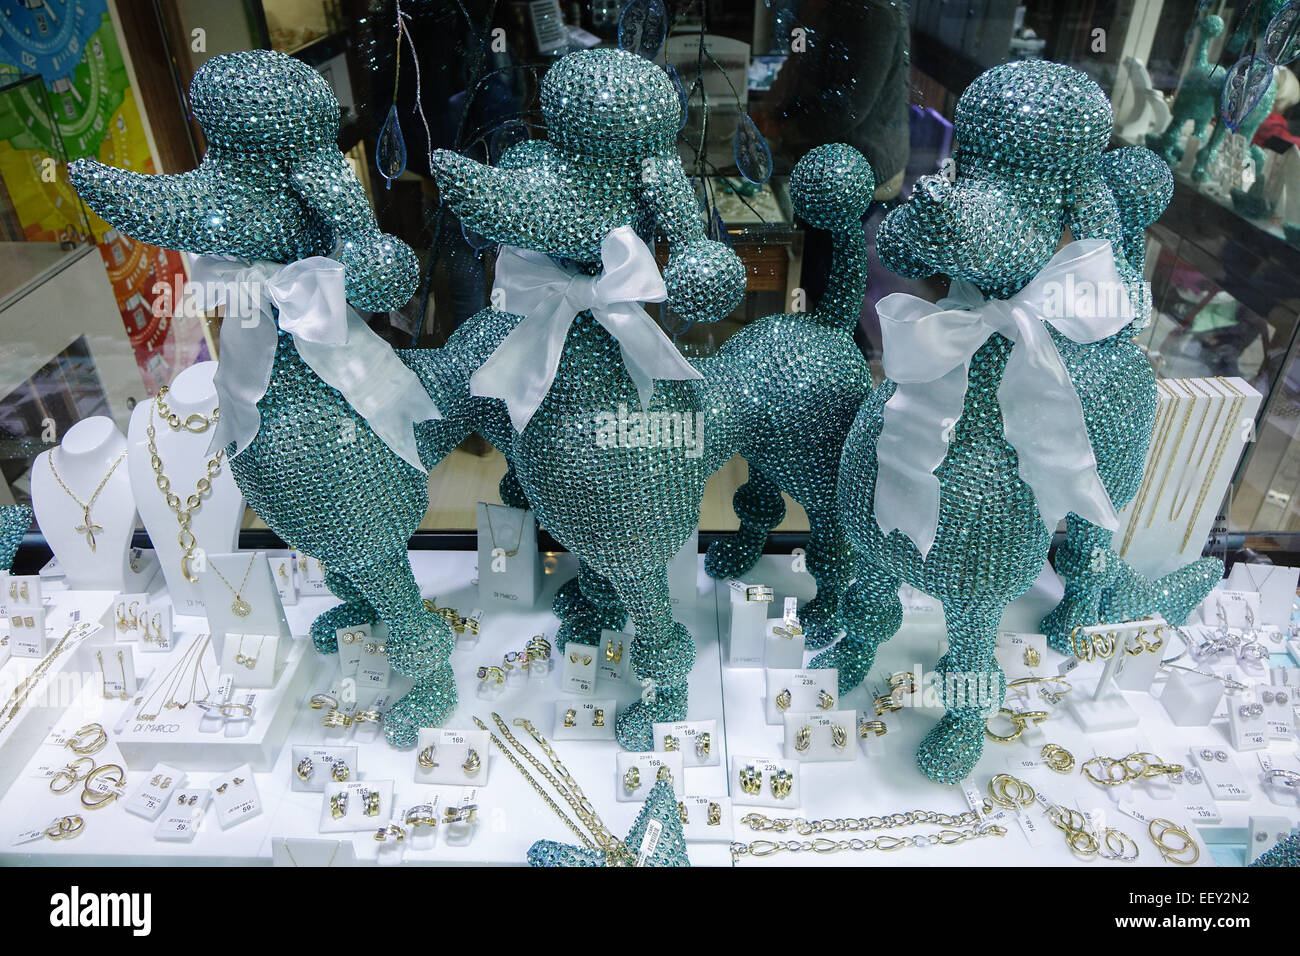 Three bejewelled poodles in a shop display in Benidorm, Spain - Stock Image